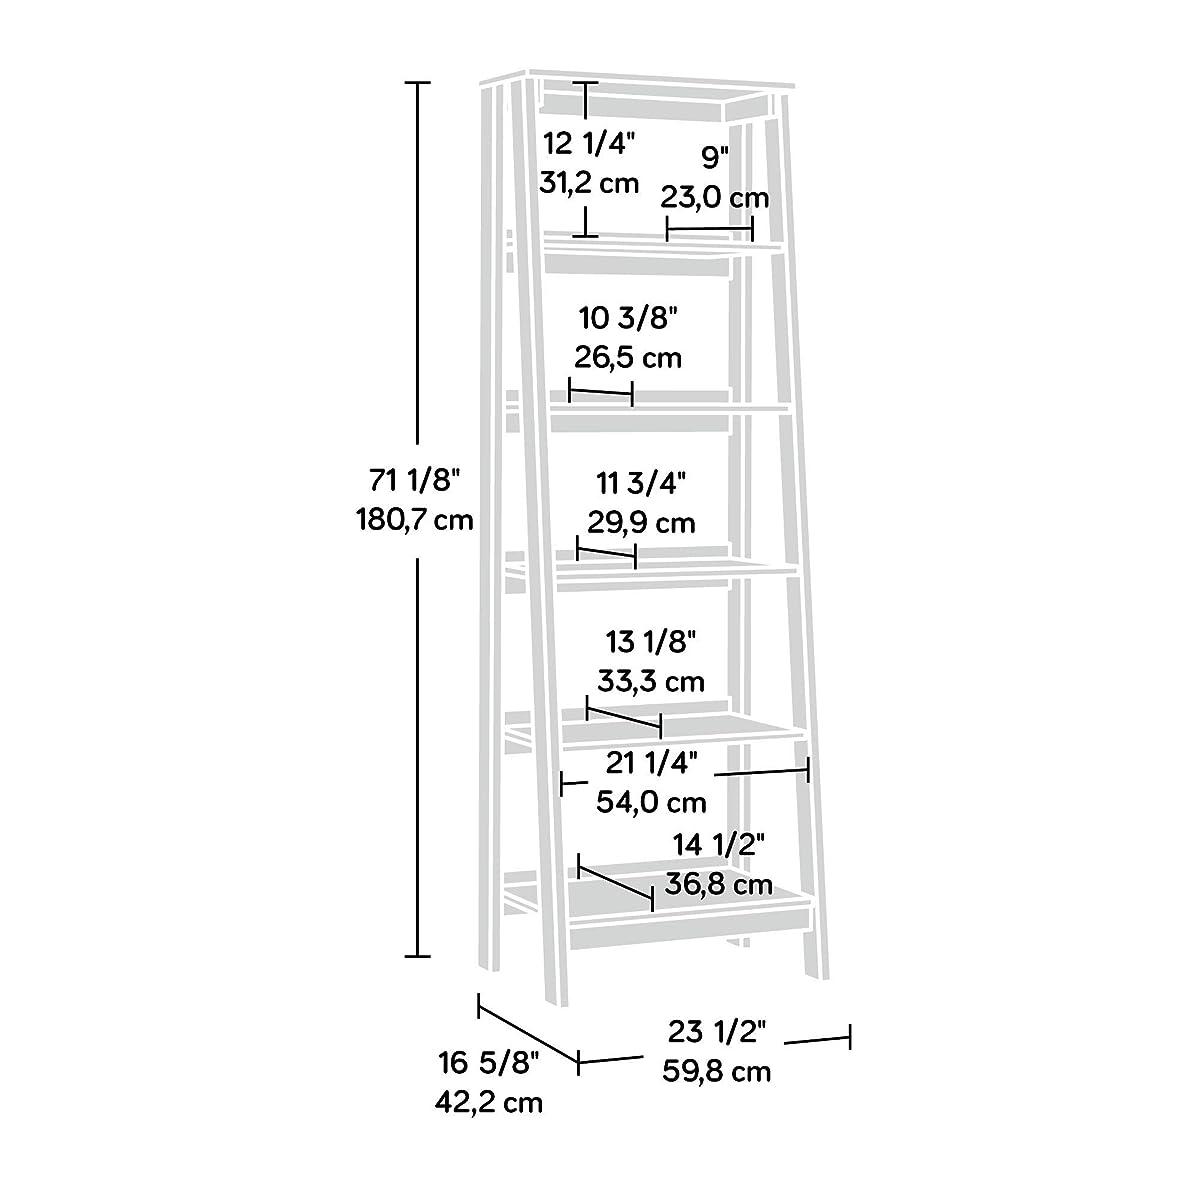 "SauderTrestle 5 Shelf Bookcase, W: 23.54"" x L: 16.61"" x H: 71.14"", Jamocha Wood Finish"